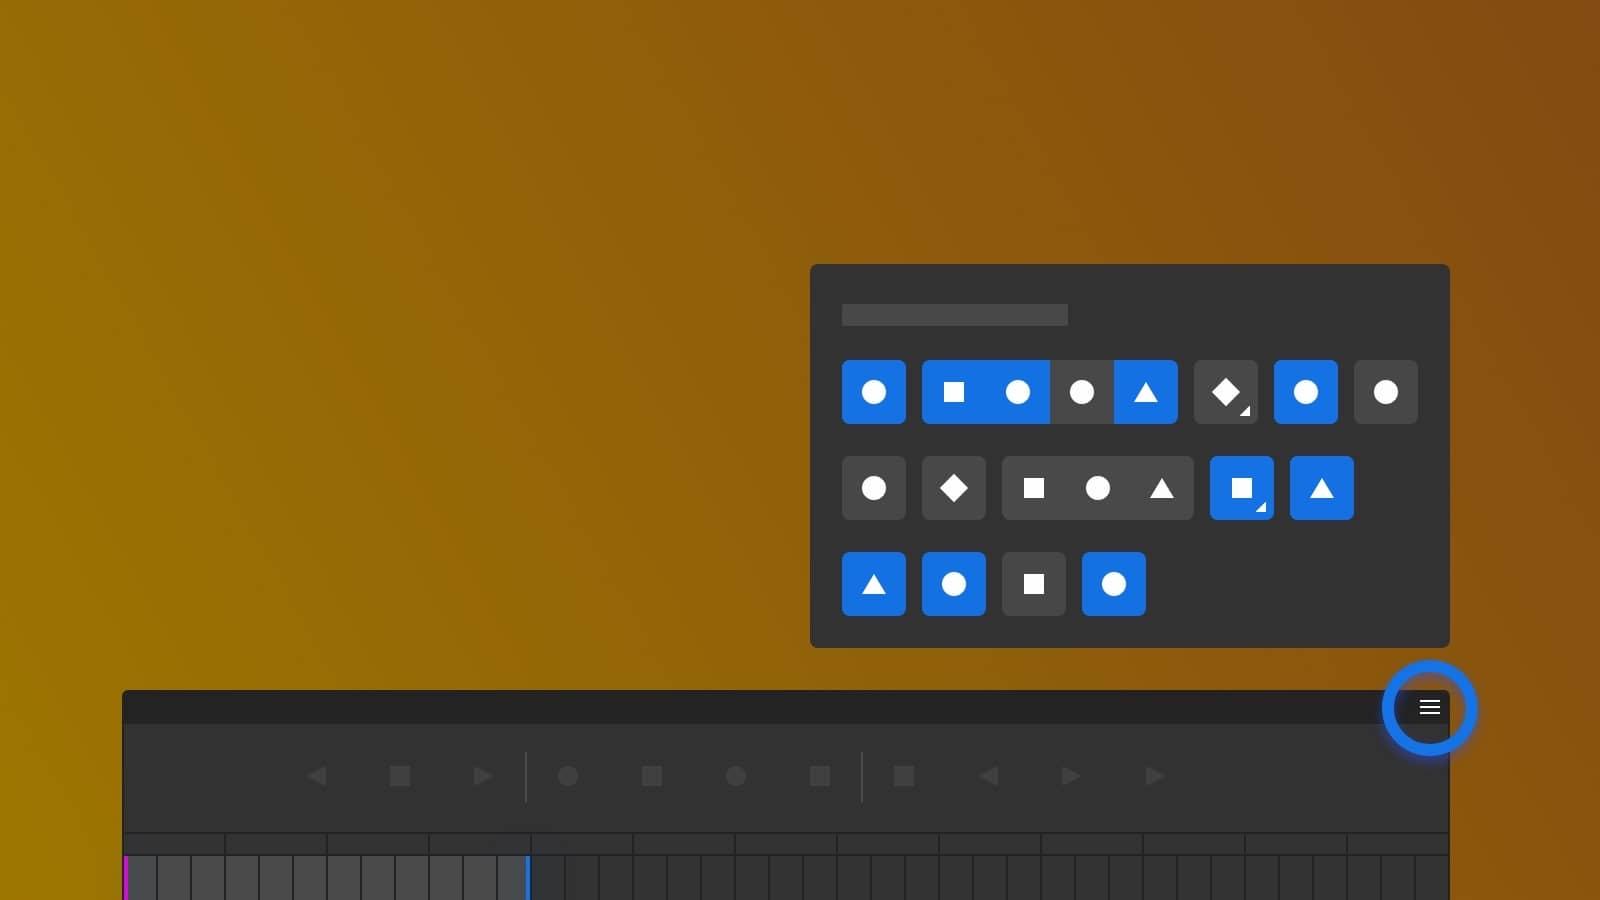 Animate 2021 for mac 时间轴和符号增强功能